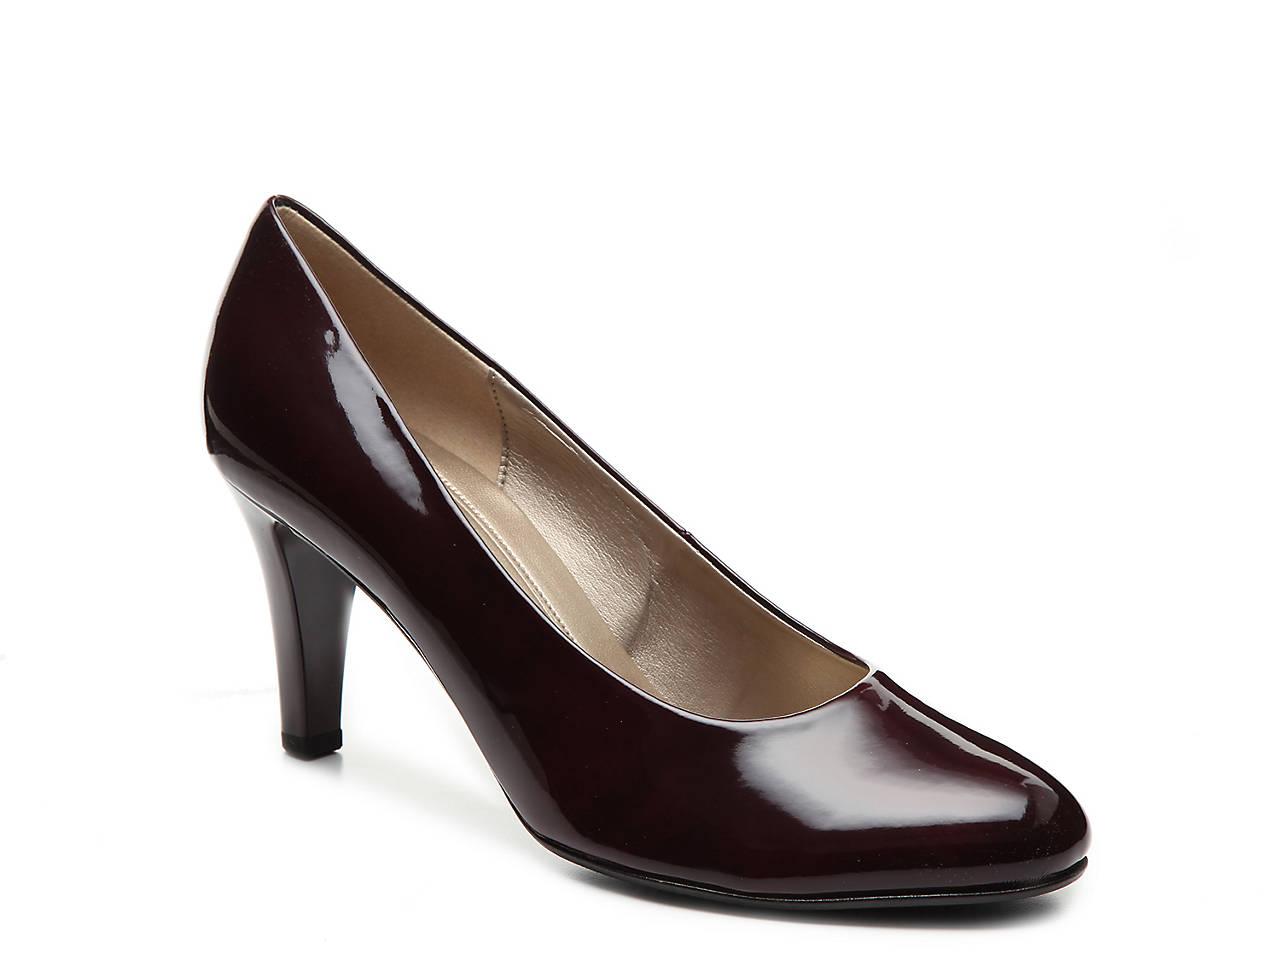 91fe82b9b7952 Gabor 75210 Pump Women's Shoes   DSW